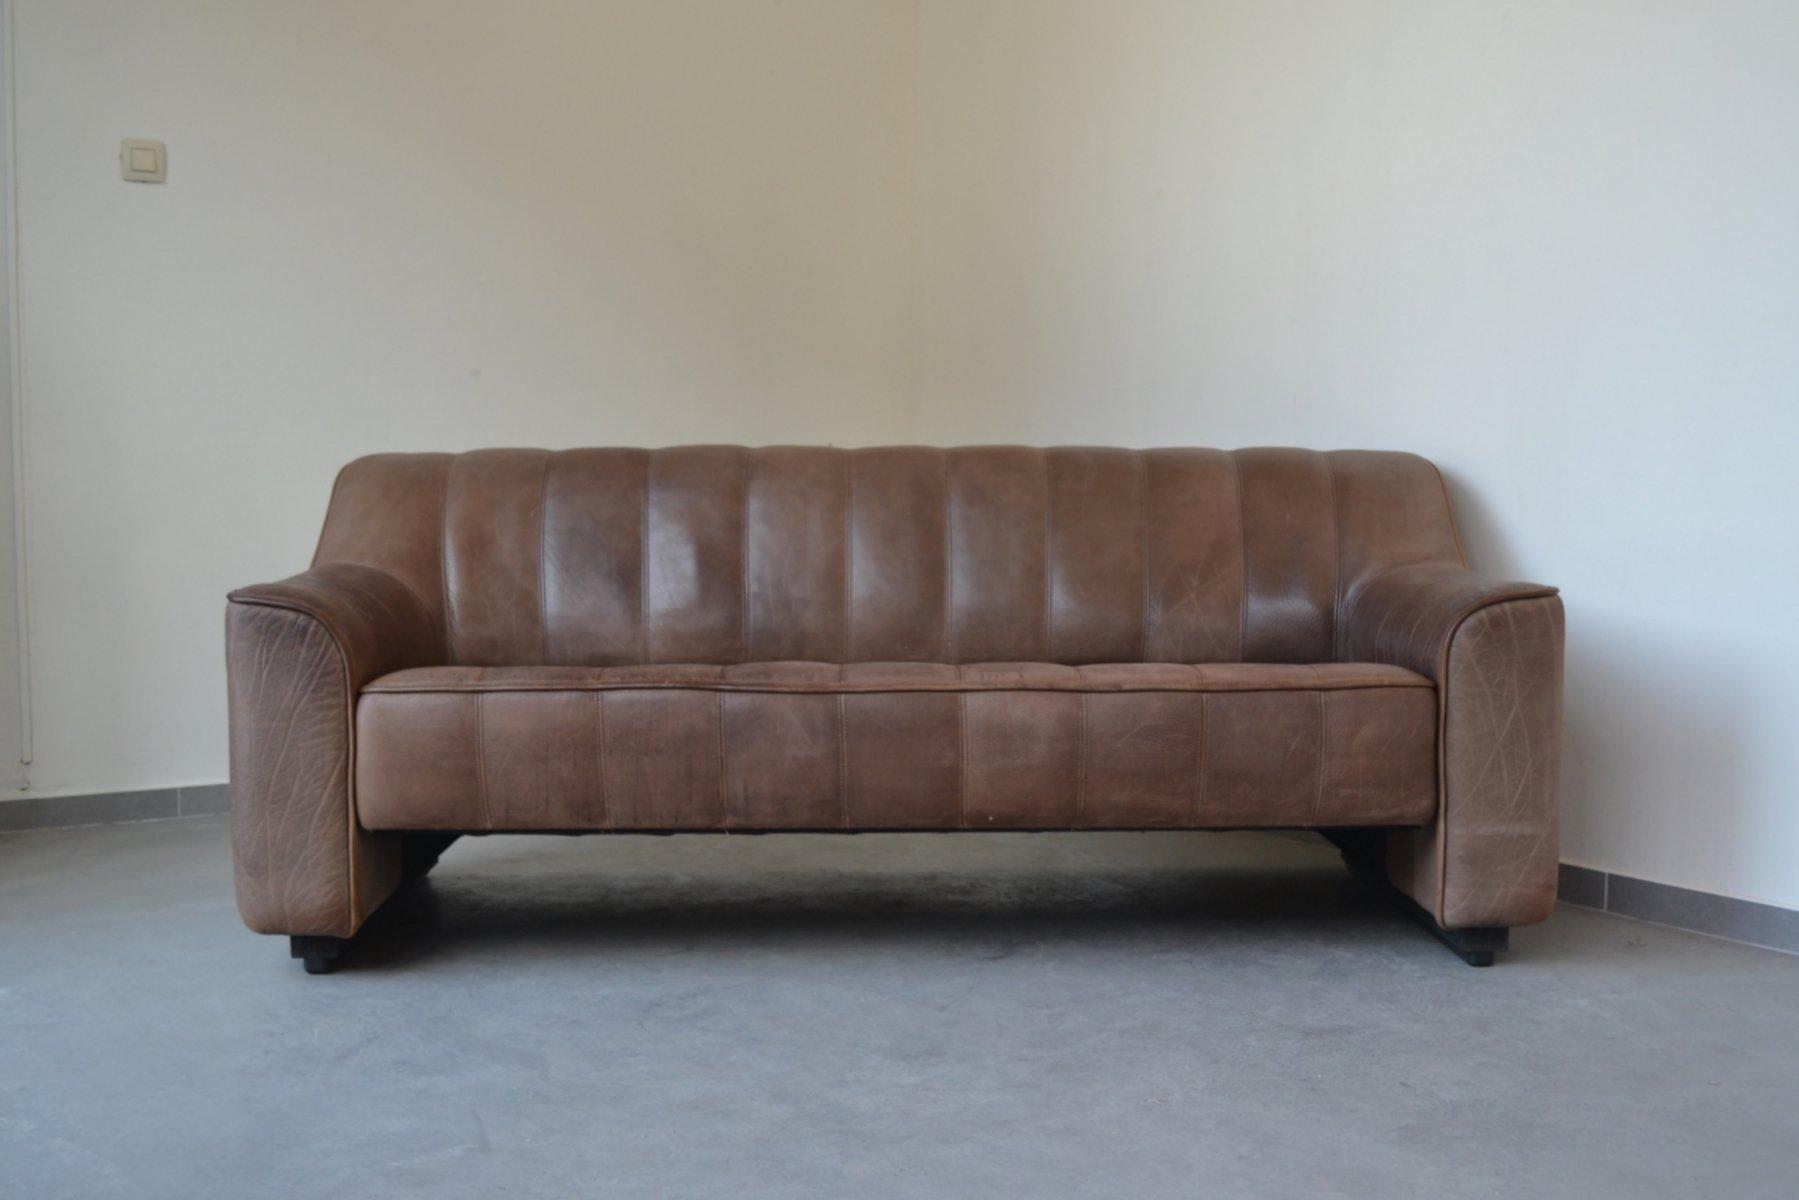 Vintage DS44 3-Sitzer Sofa von de Sede, 1970er